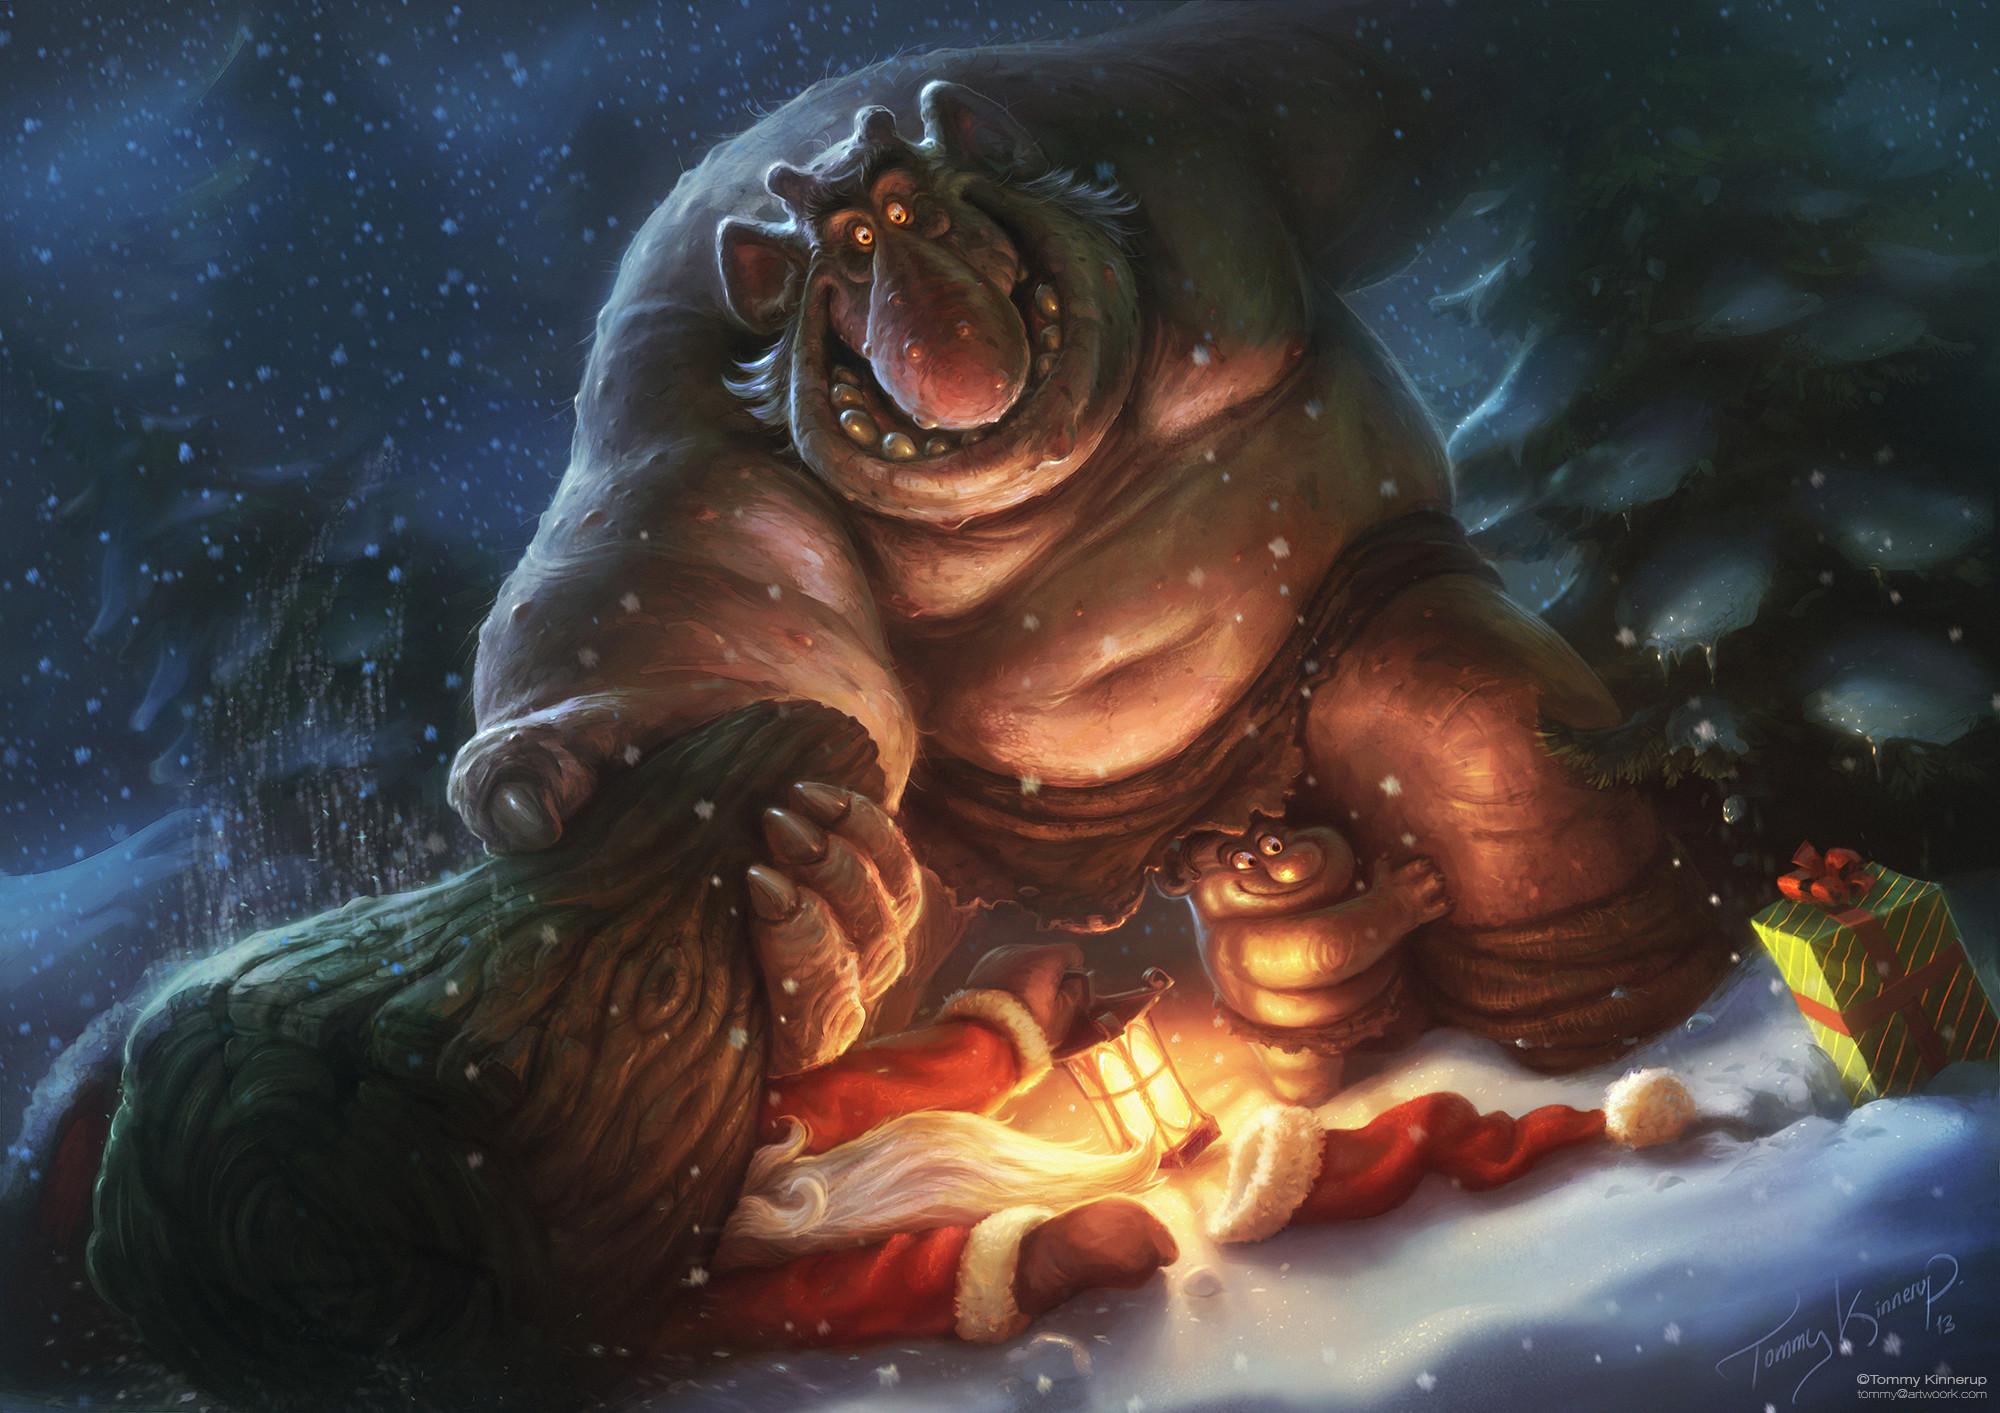 Merry Christ'smash!